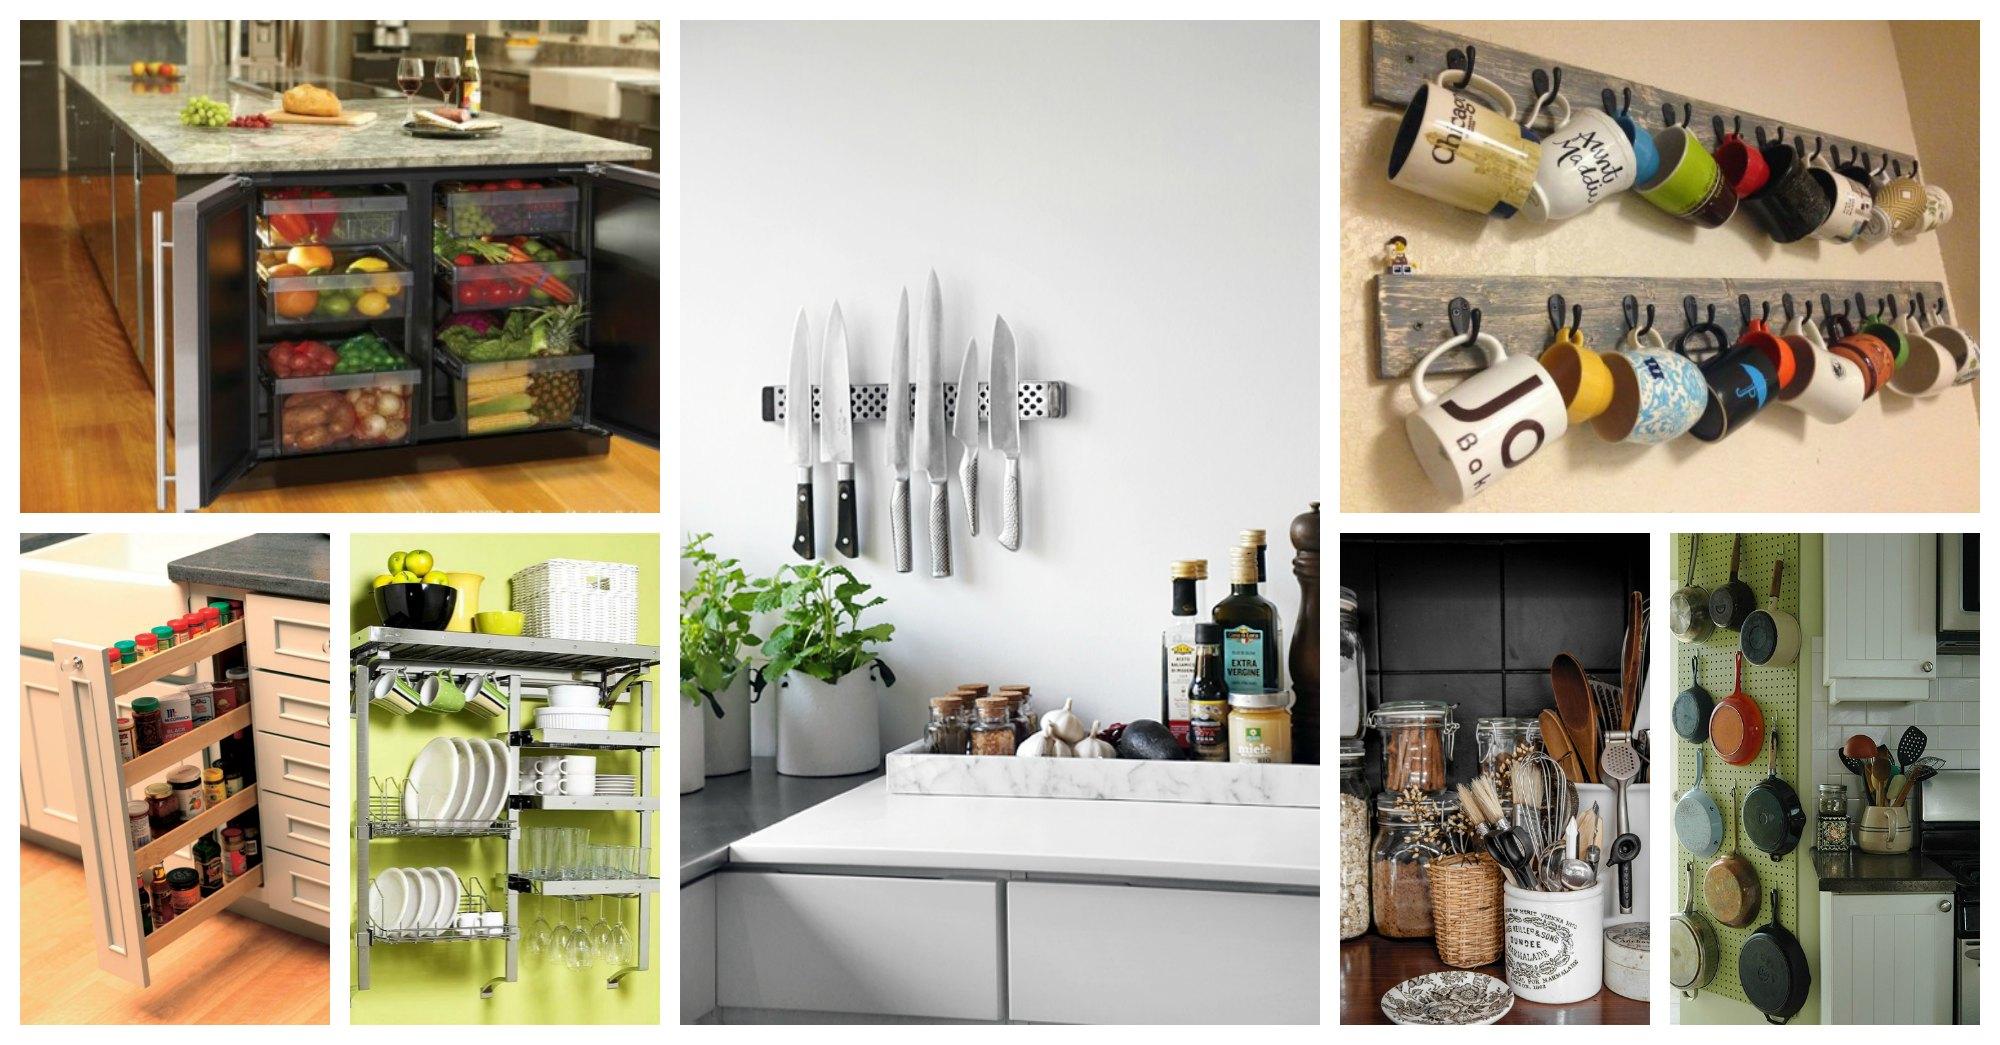 Life-Changing Kitchen Organization Ideas